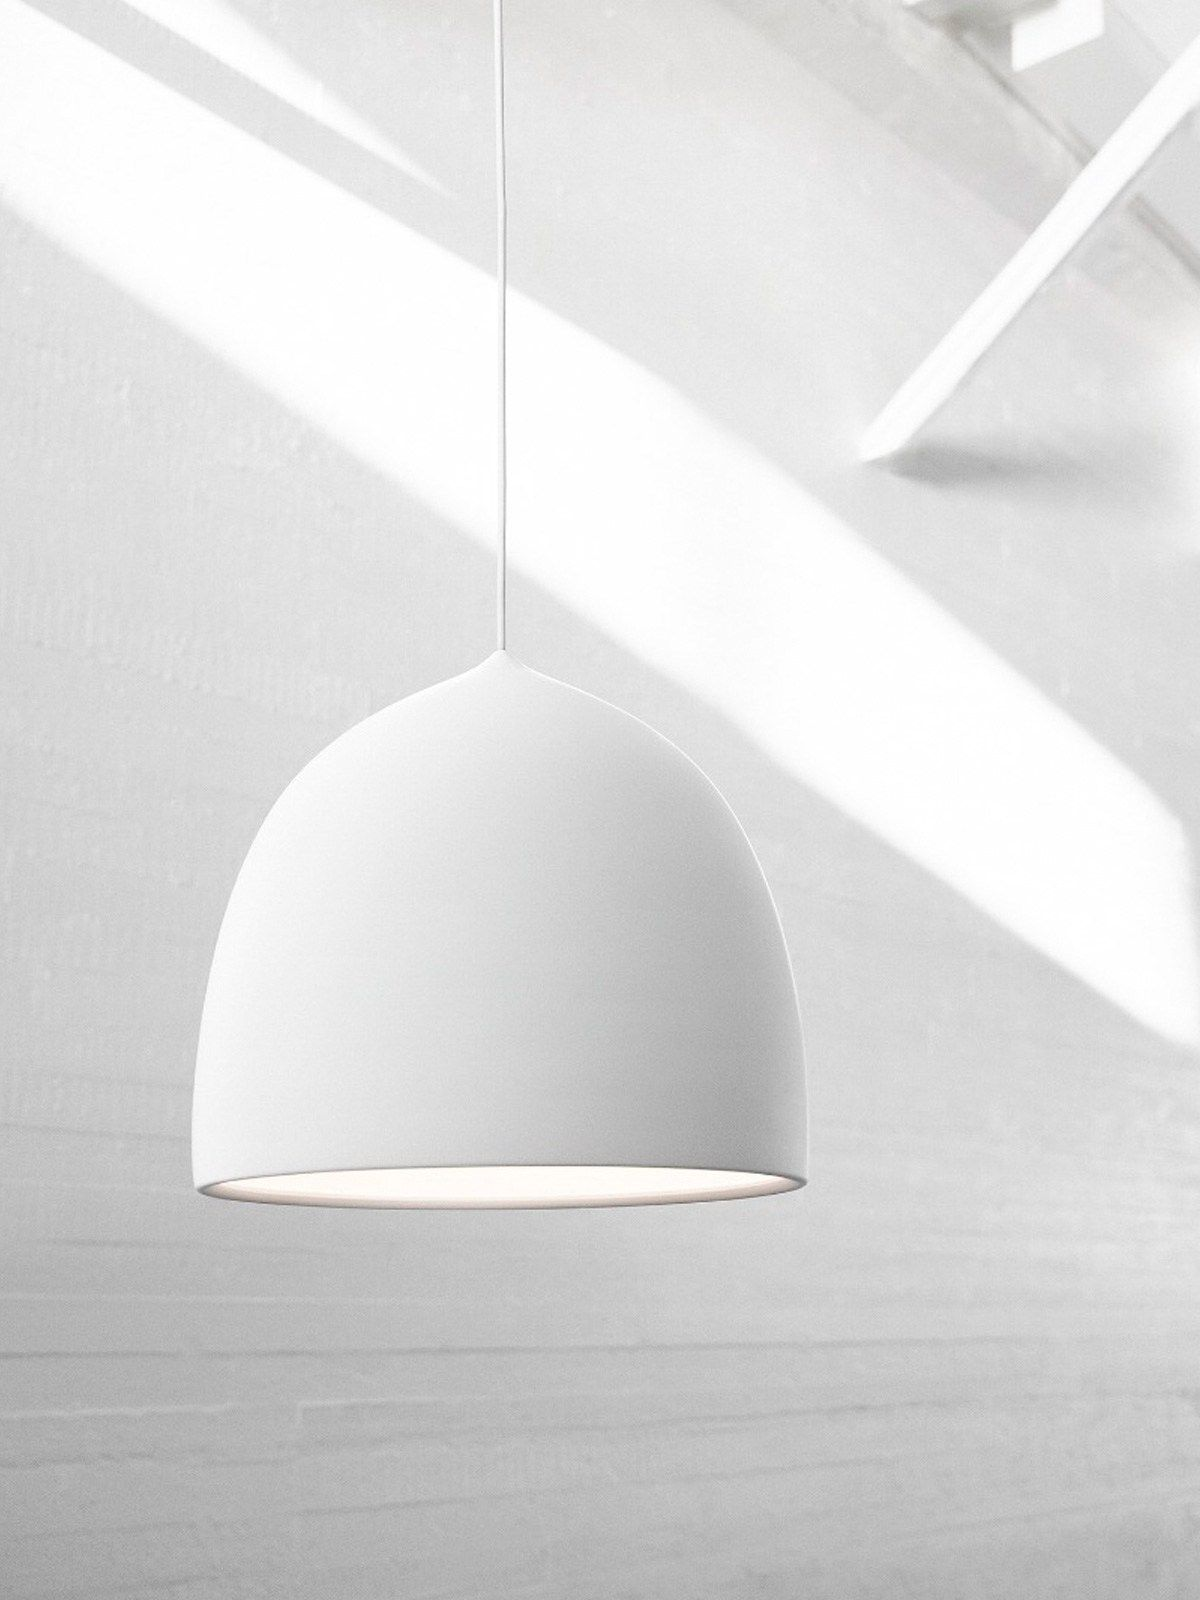 SUSPENCE P2   Anhänger lampen, Lampe weiß